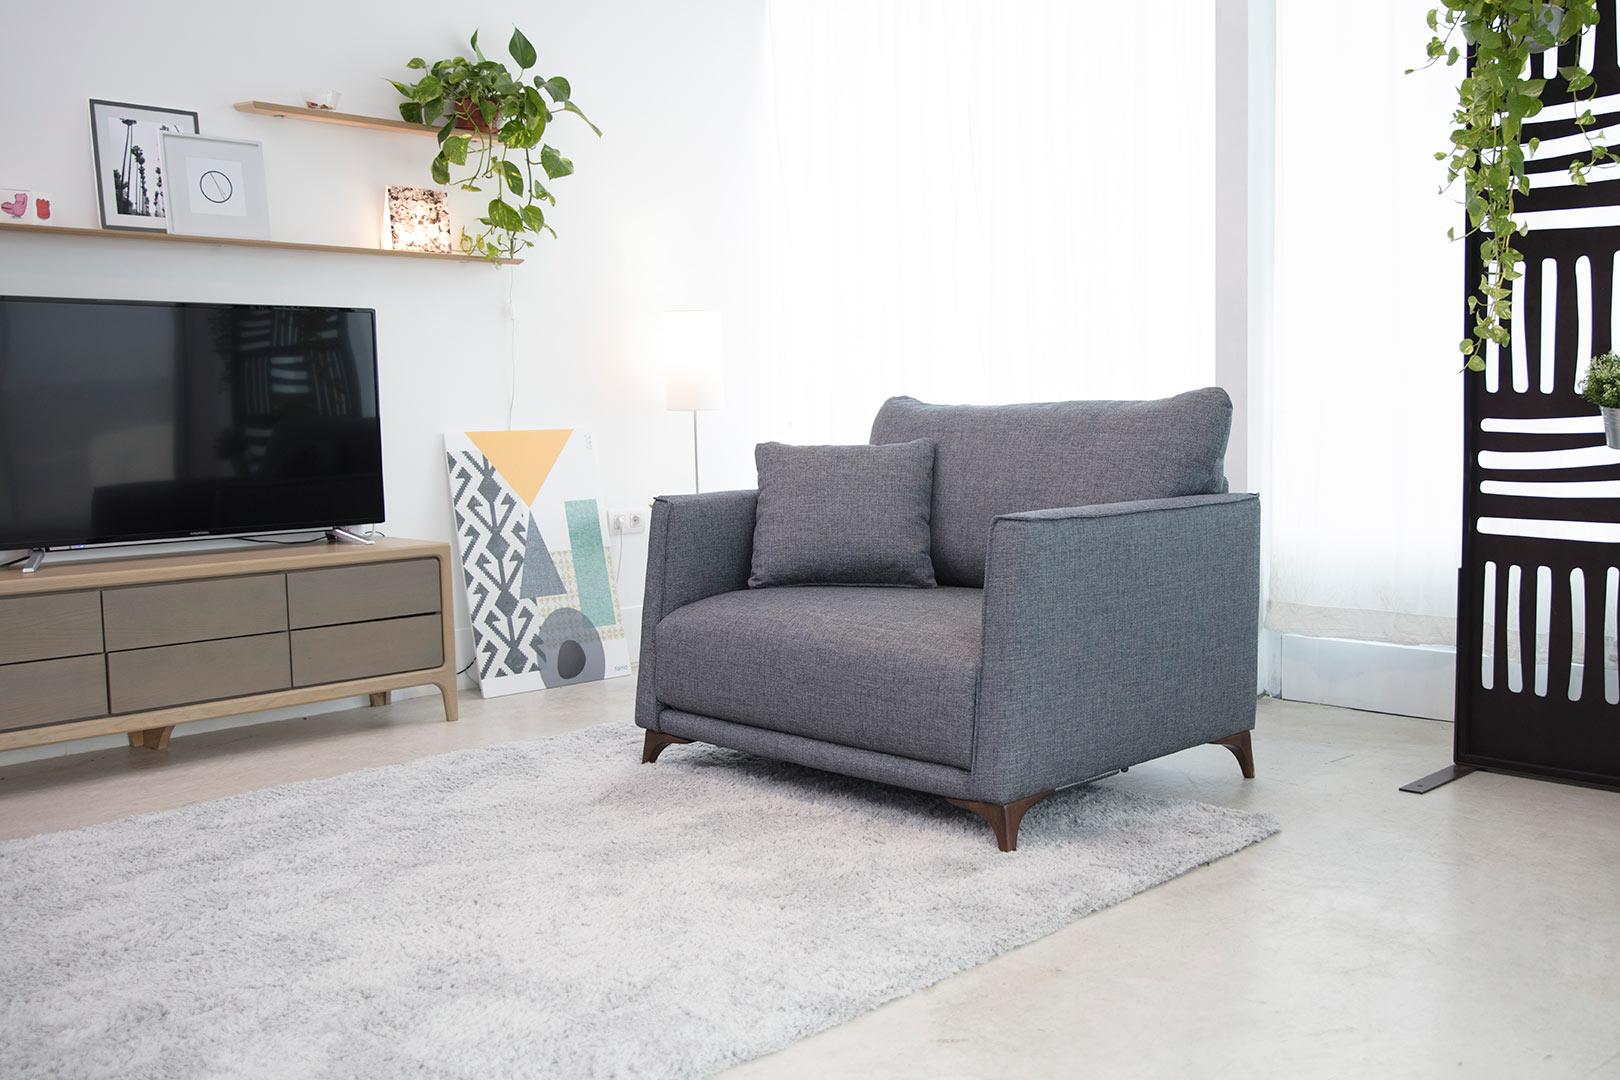 Dali sillón cama 2020 02